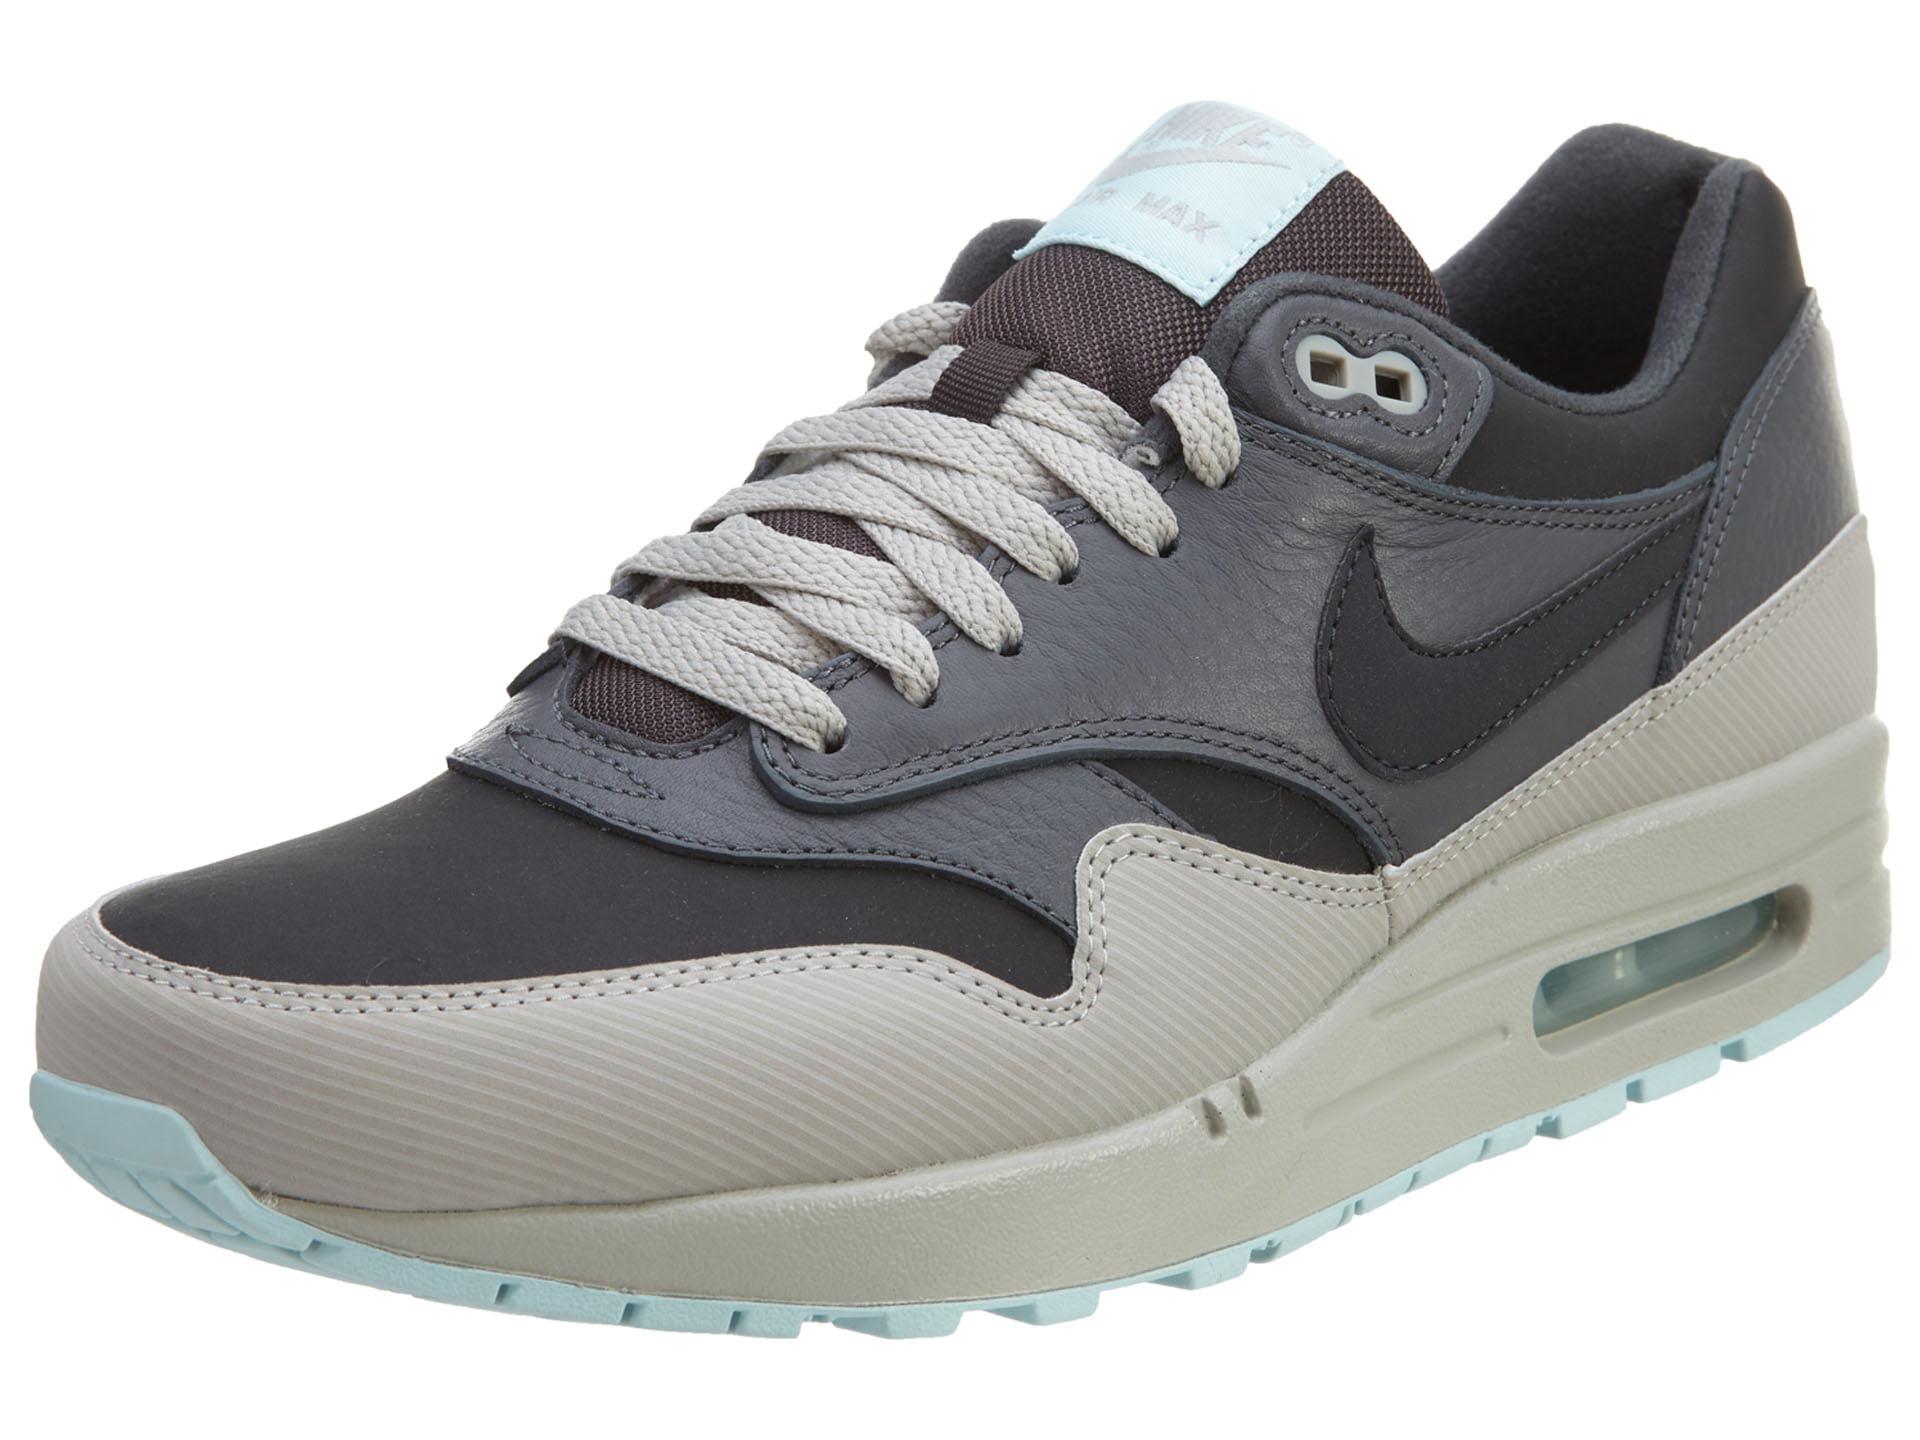 Nike - Nike Air Max 1 Ltr Mens Style : 654466 - Walmart.com